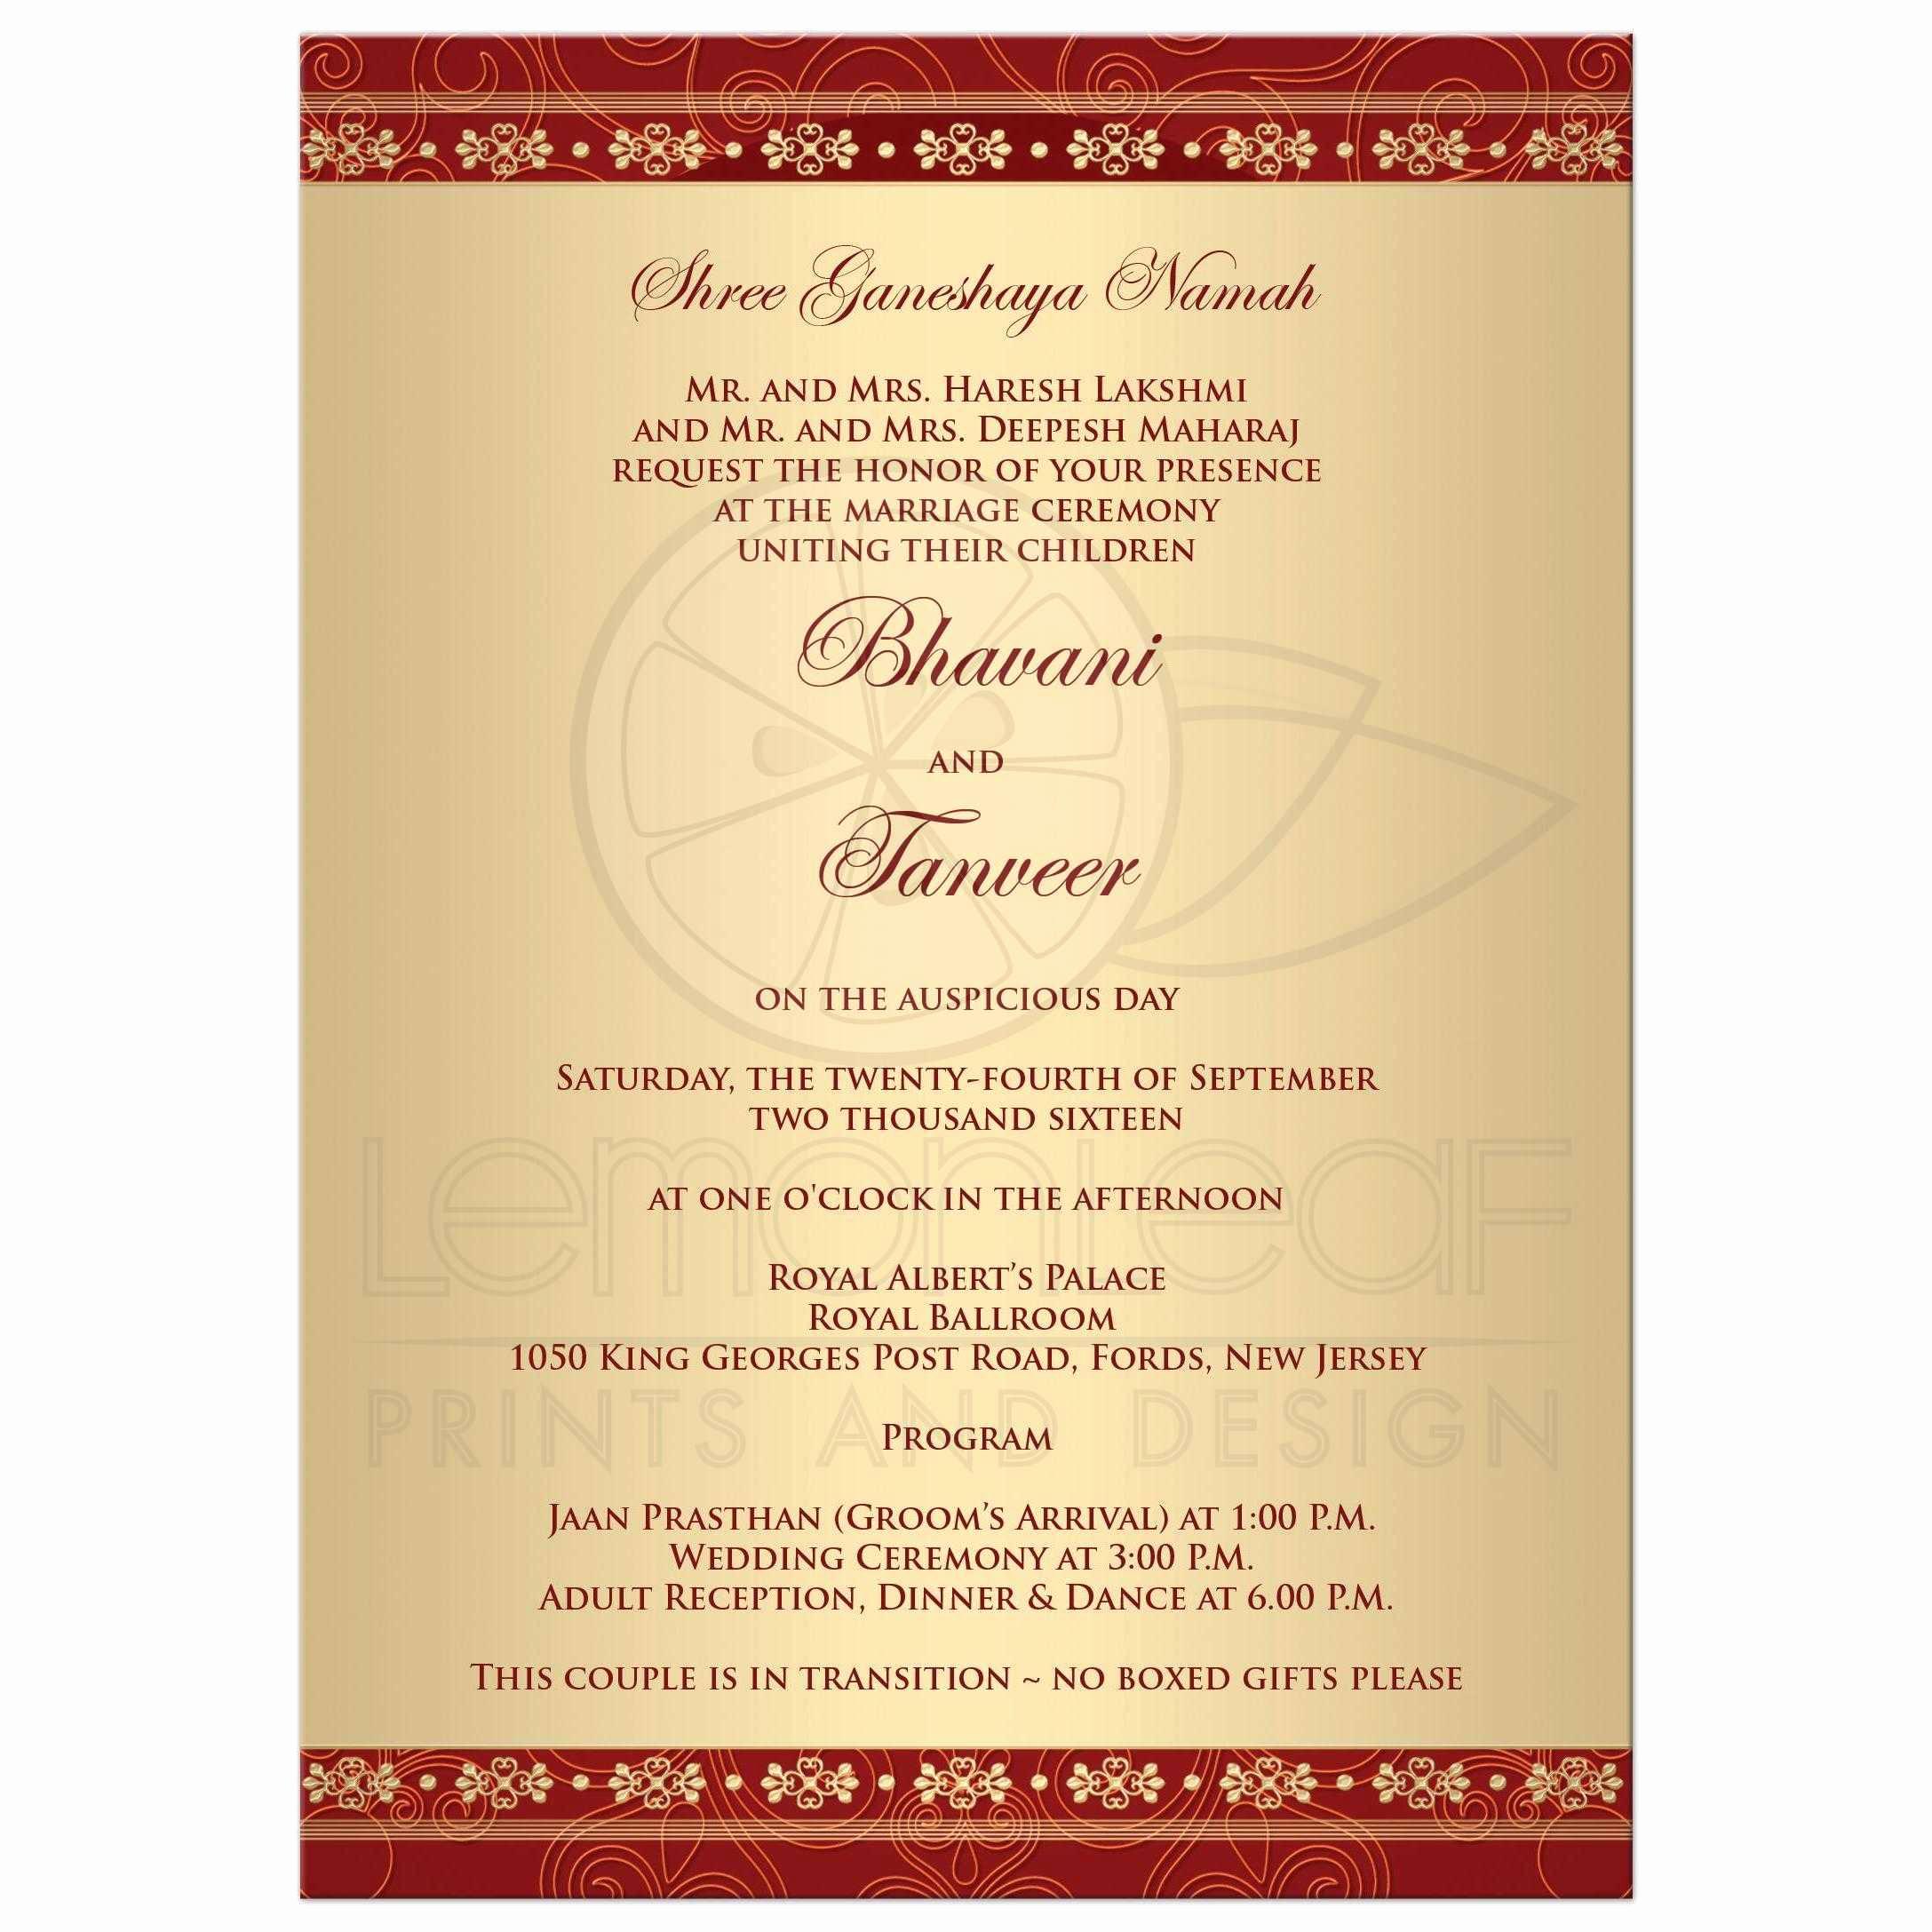 Indian Wedding Invitation Sample Awesome Wedding Invitation Indian Wedding Invitation Cards